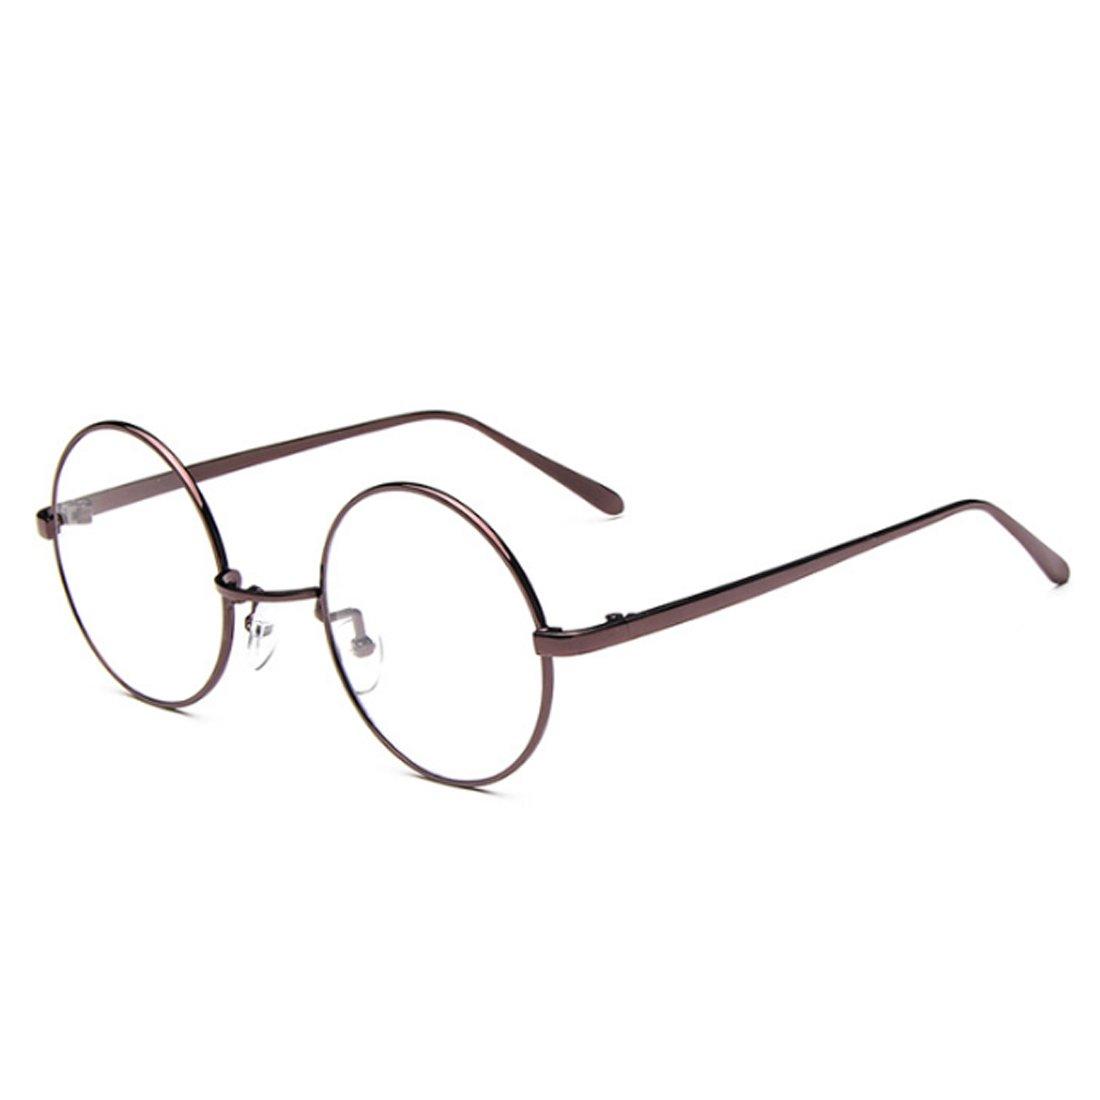 Fulision Male Female Circular myopia Glasses frame Fine Frame Retro Glasses